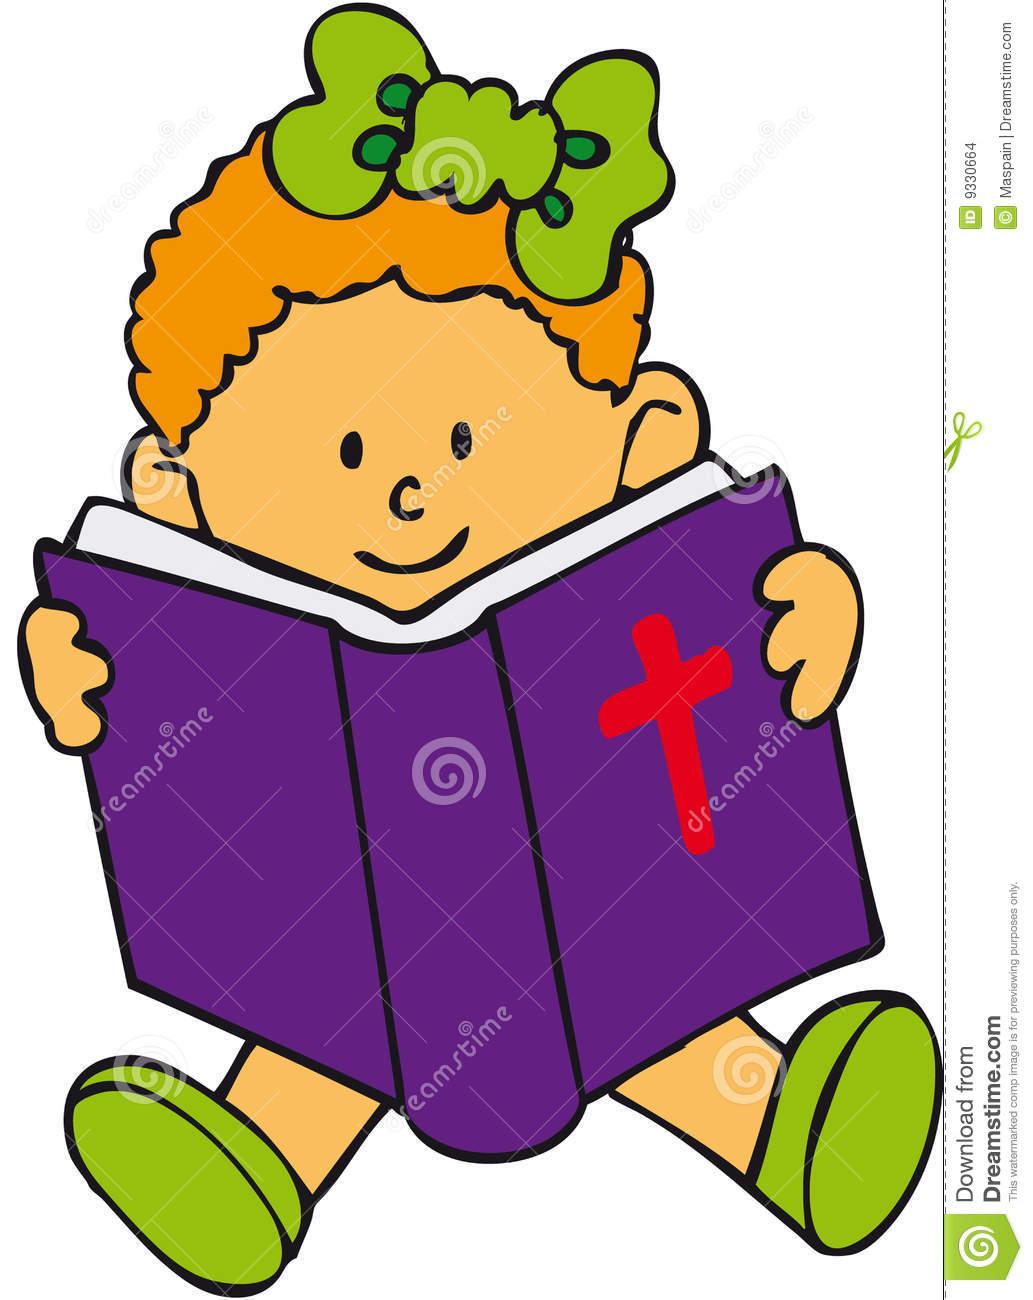 children-s bible clipart #15